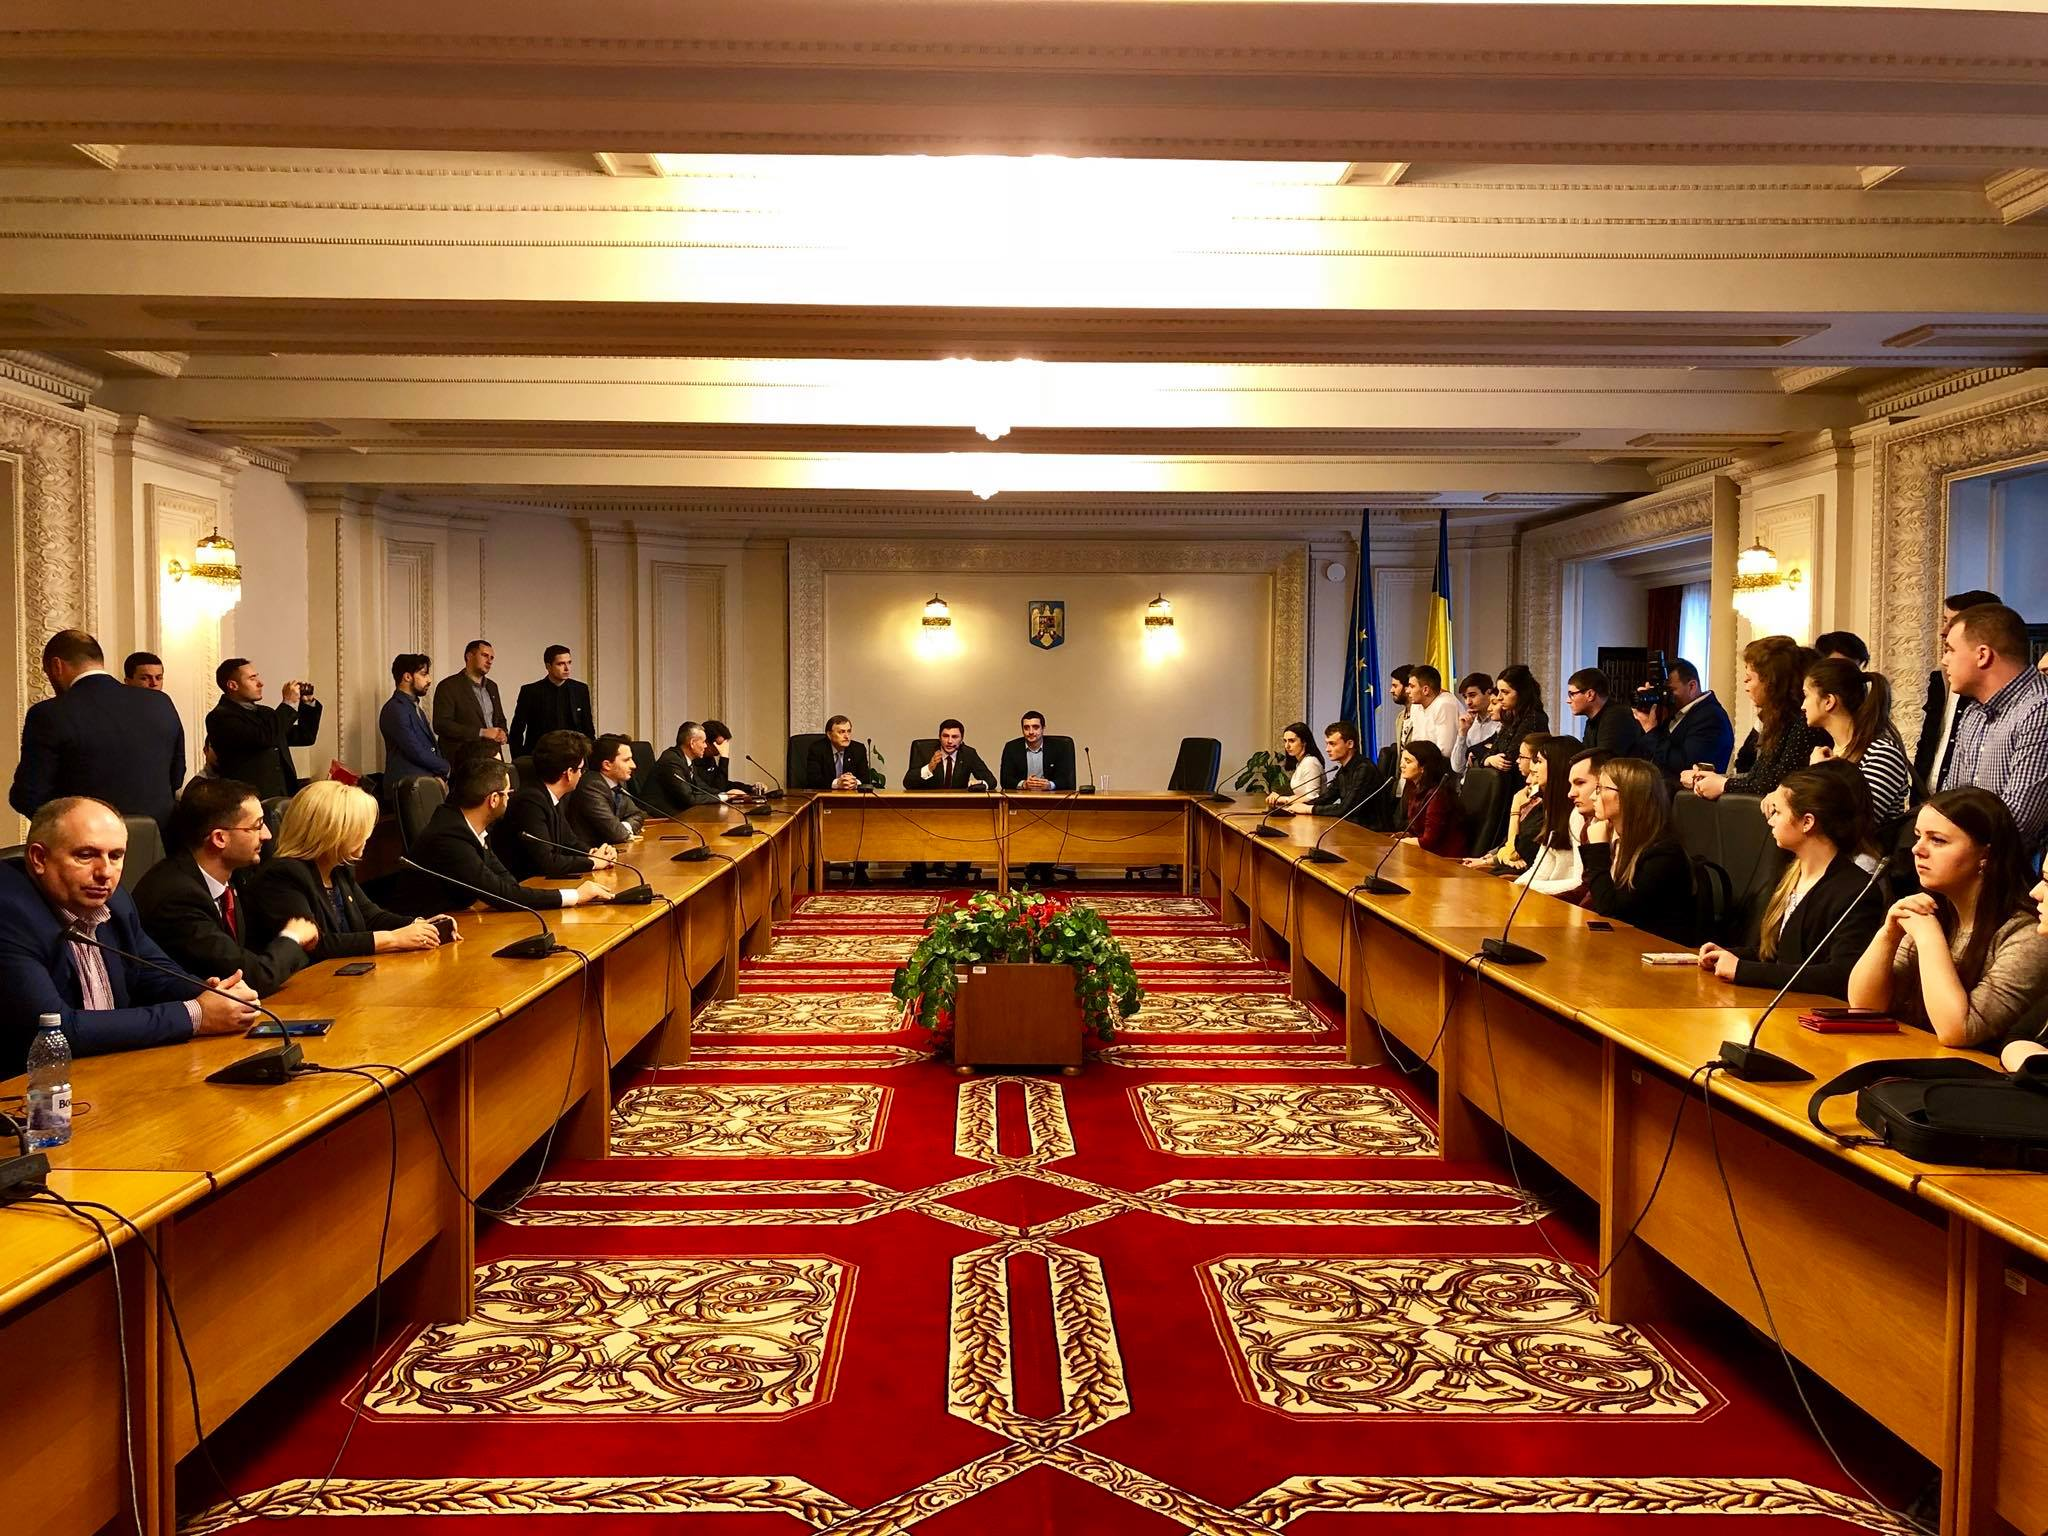 100 de stagiari din Basarabia la 100 de parlamentari